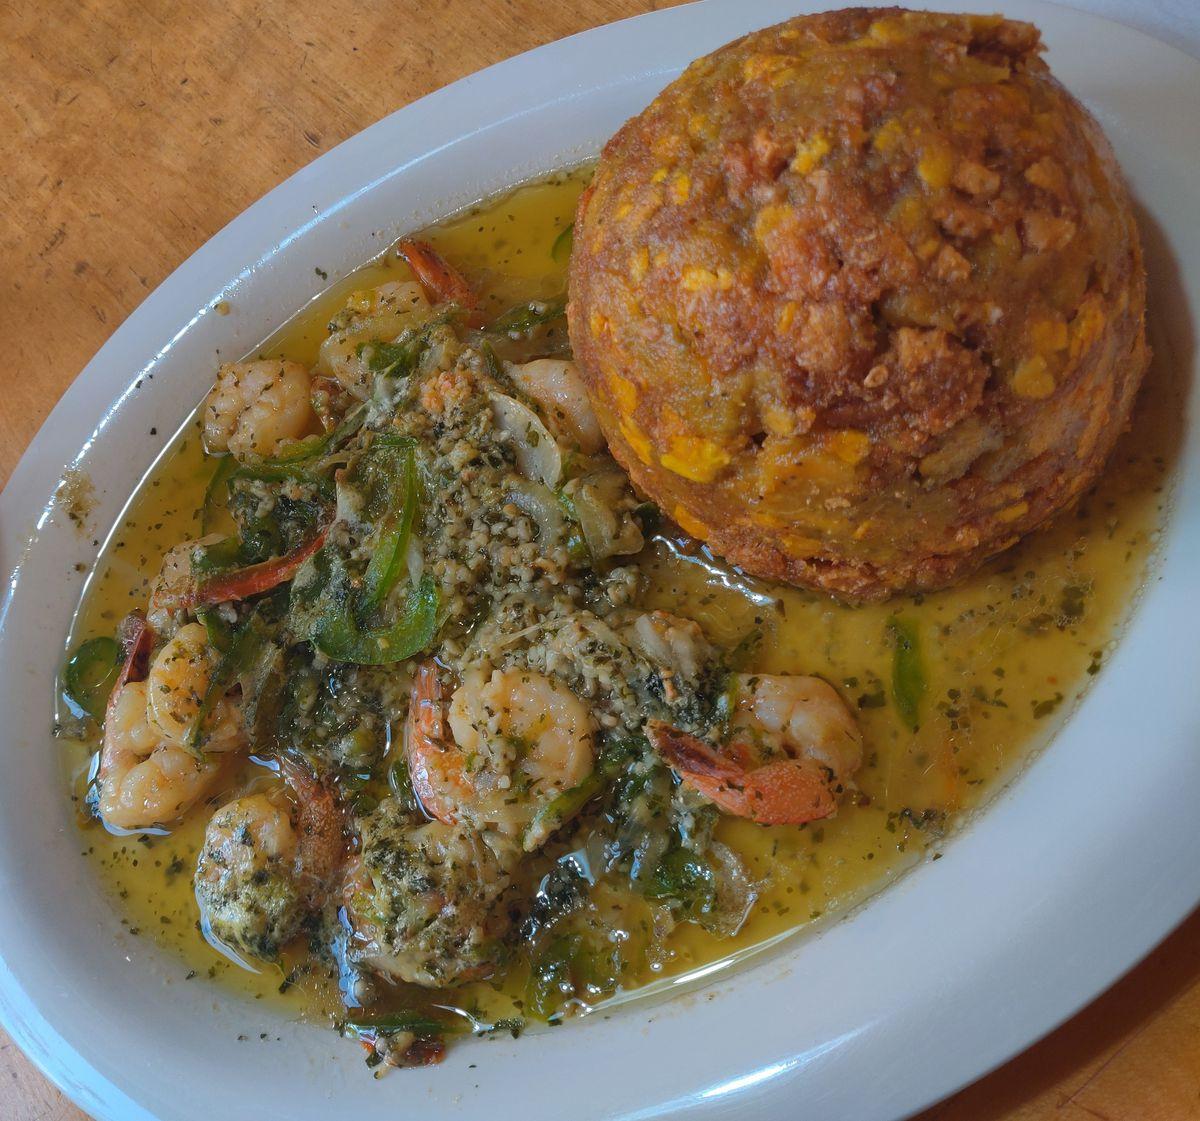 Shrimp in garlic sauce with mofongo from Oriental de Cuba